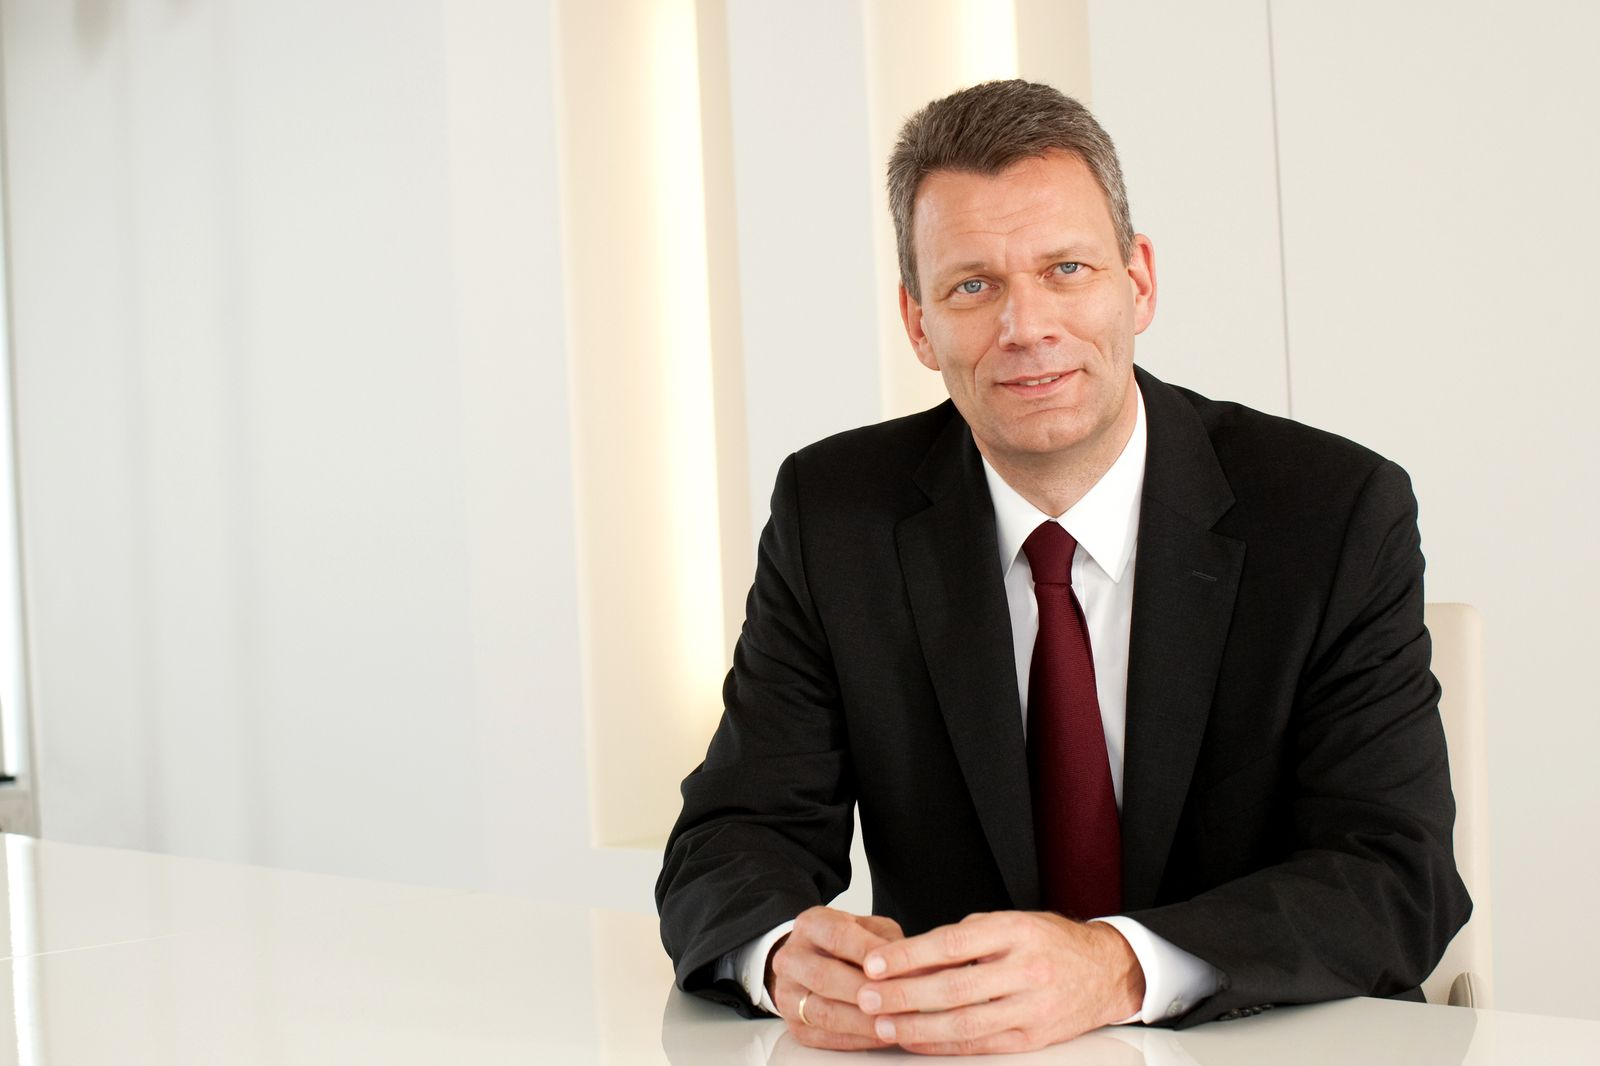 Klaus-Dieter Maubach/ E.ON AG